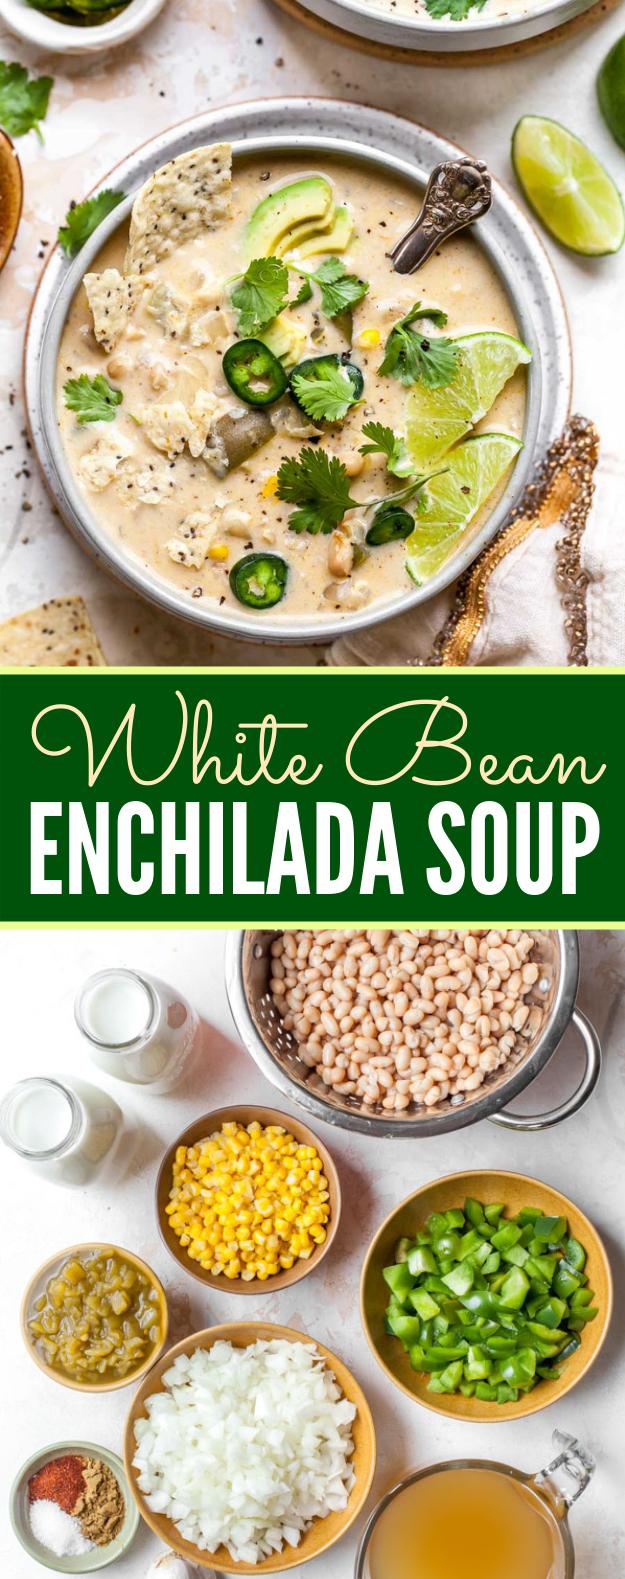 WHITE BEAN ENCHILADA SOUP #vegetarian #lunch #soup #veggies #vegetables